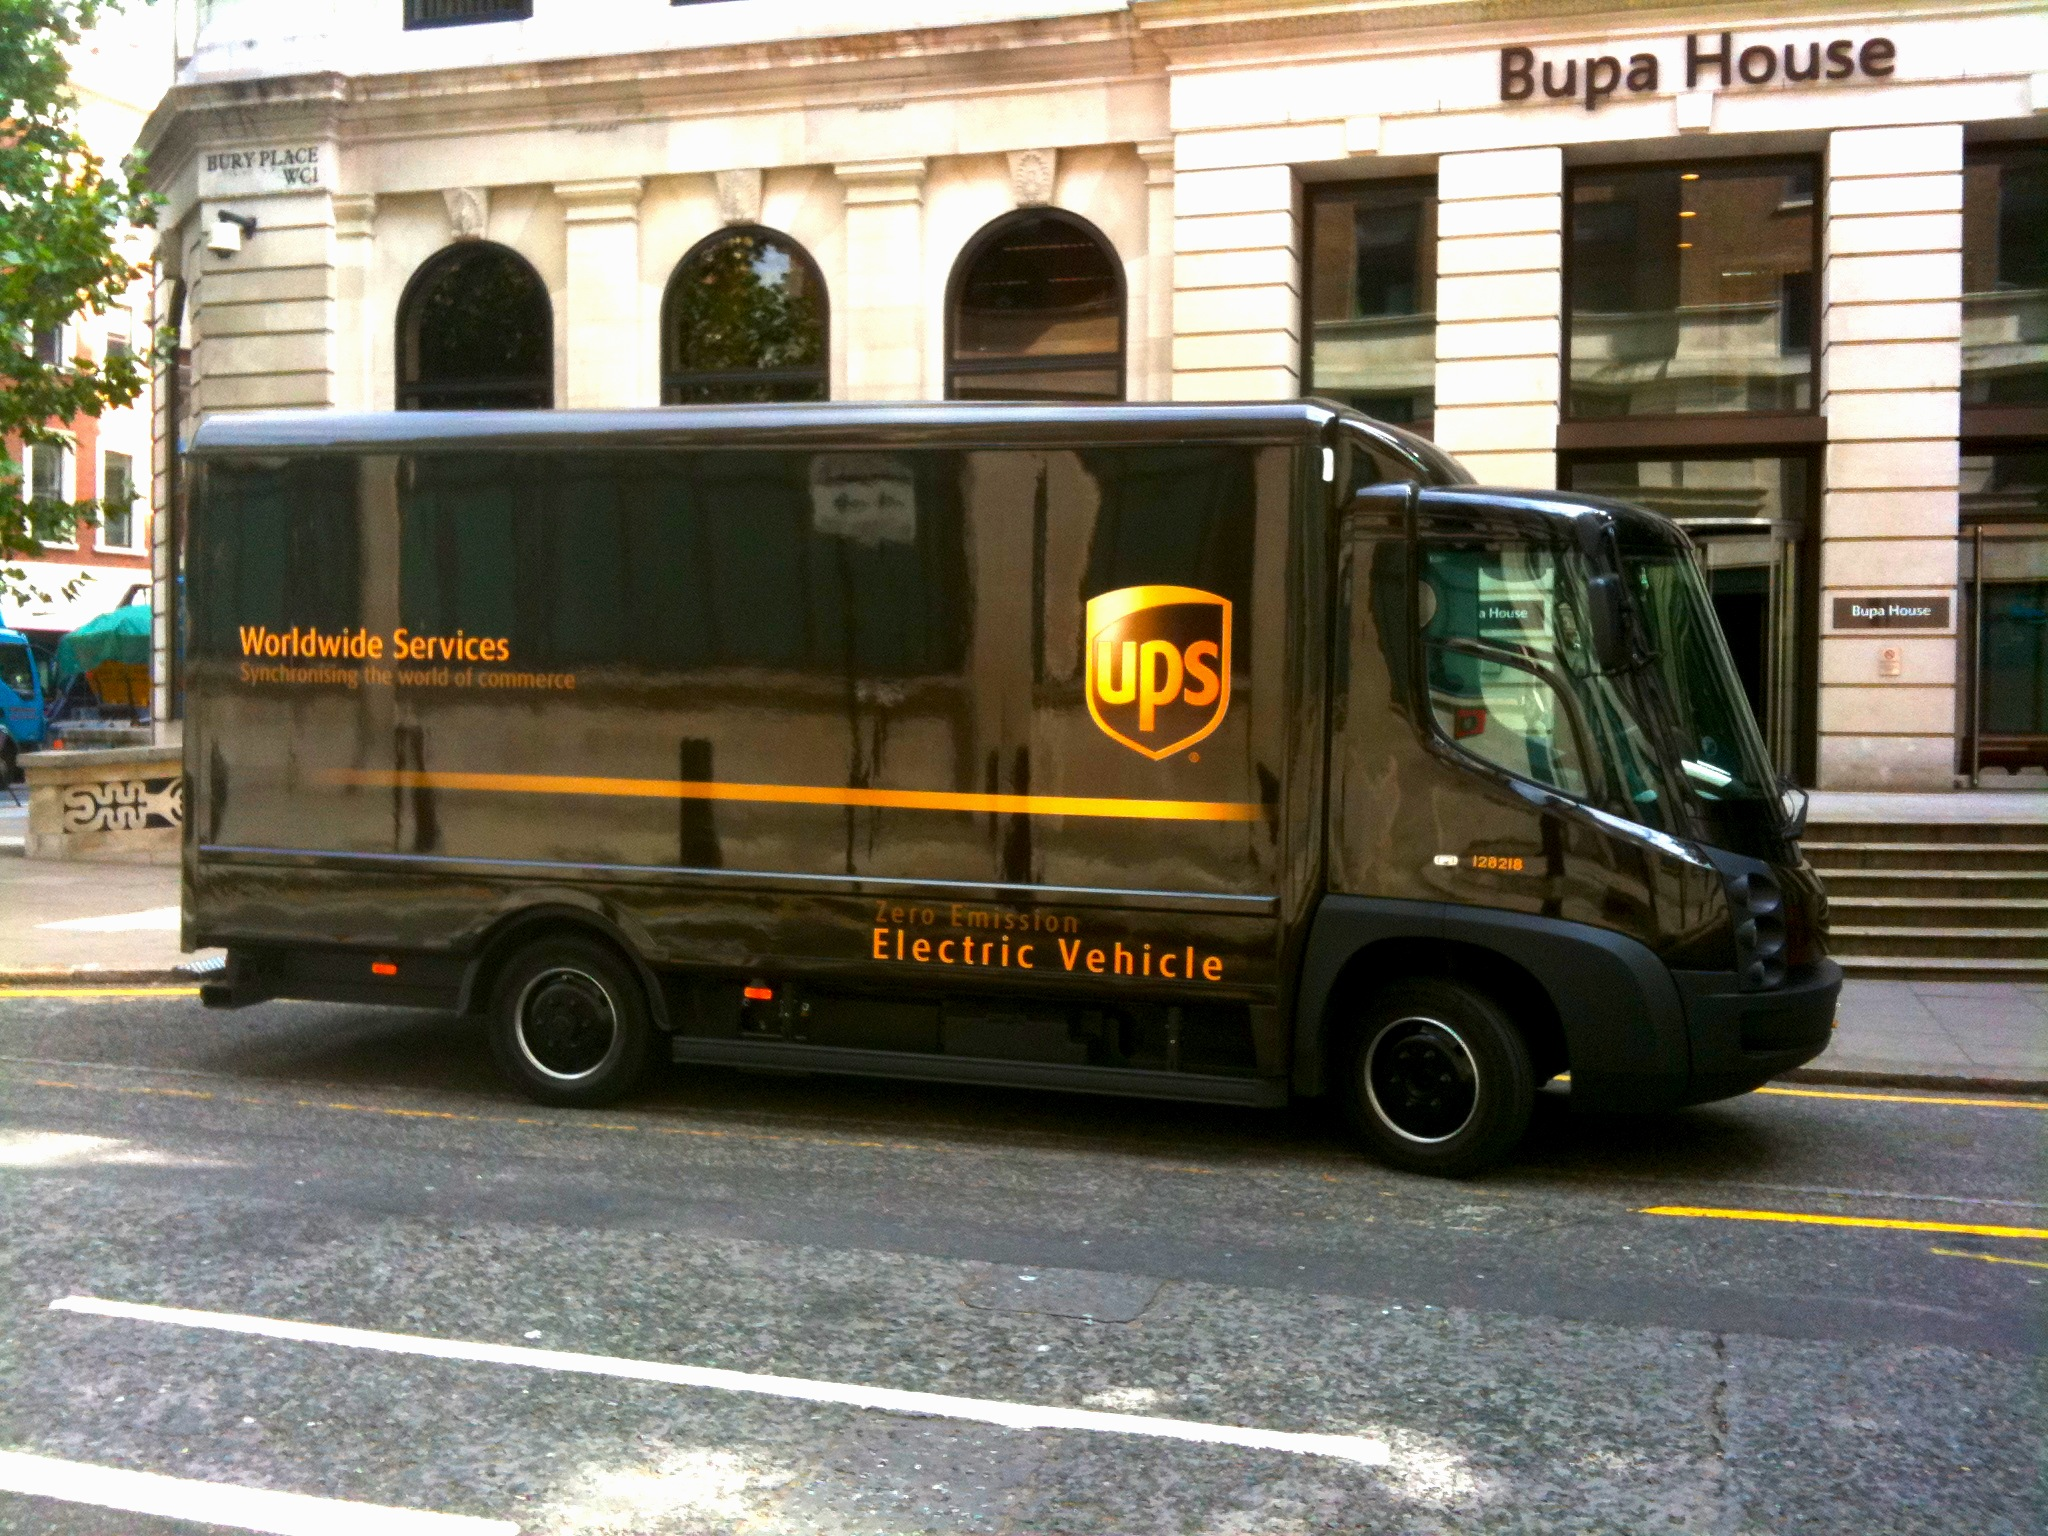 File:UPS electric van (3831219067) jpg - Wikimedia Commons